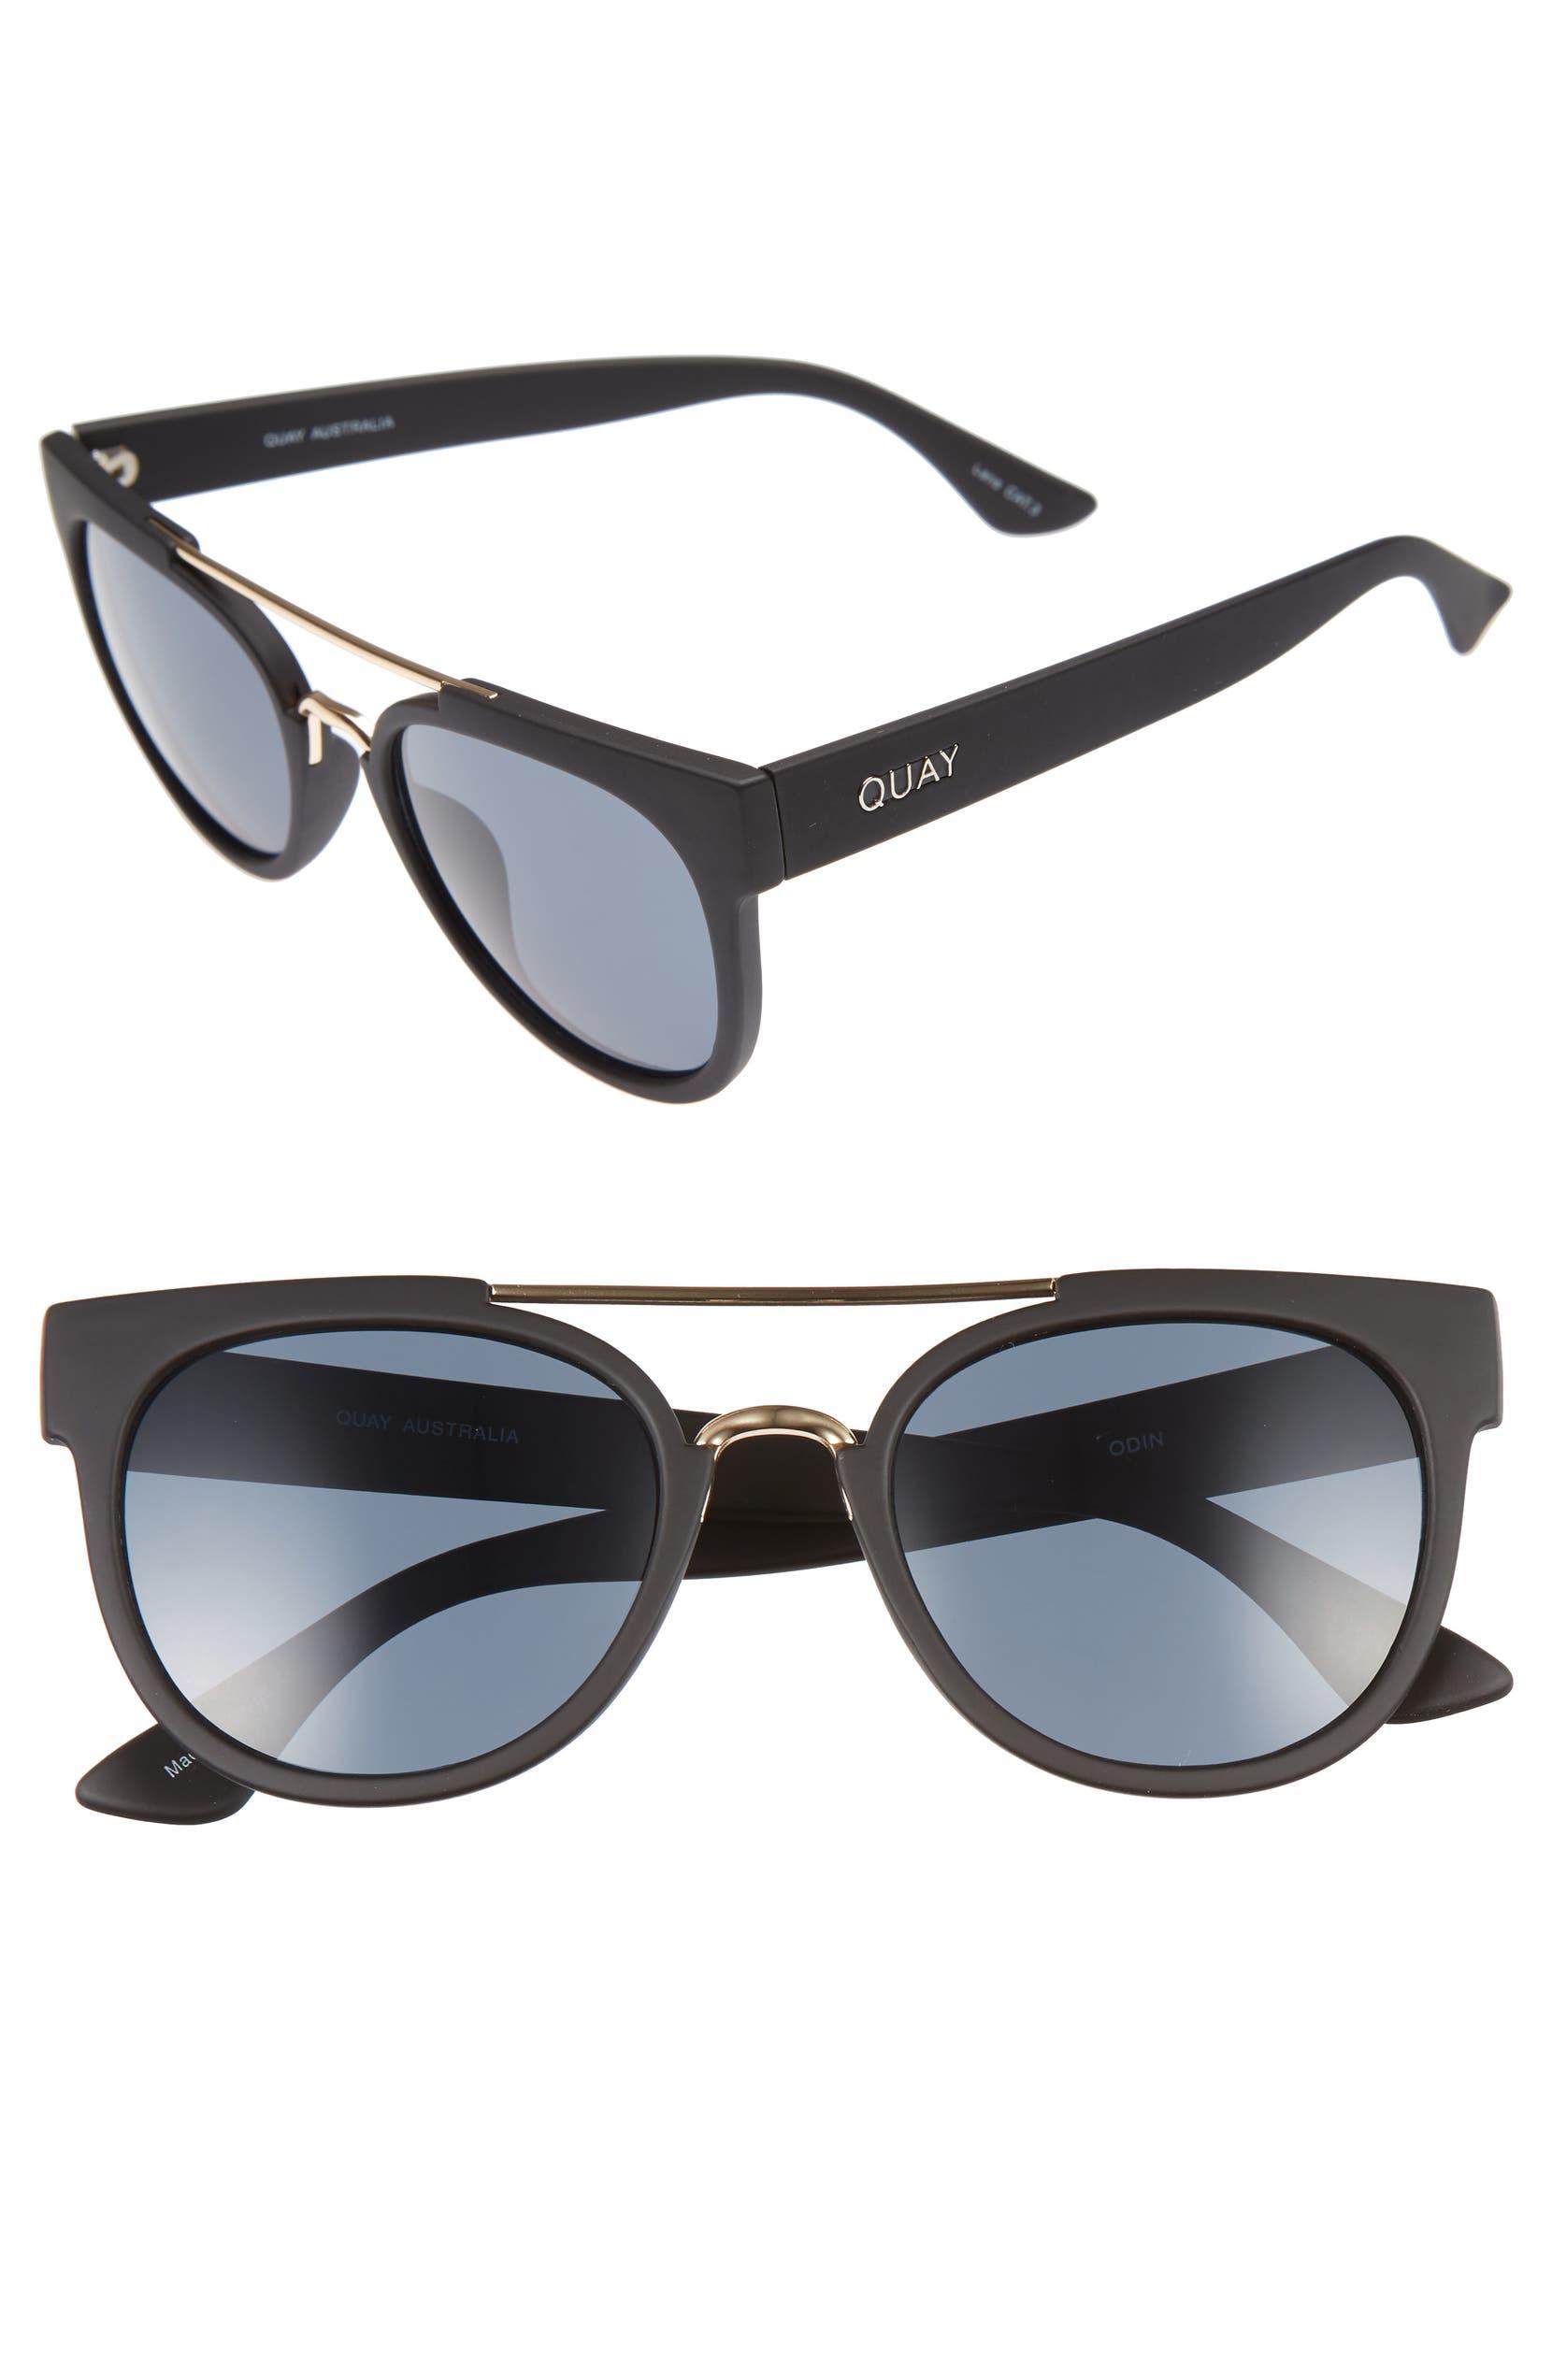 76c52a3d51 Quay Australia Odin 55mm Round Sunglasses